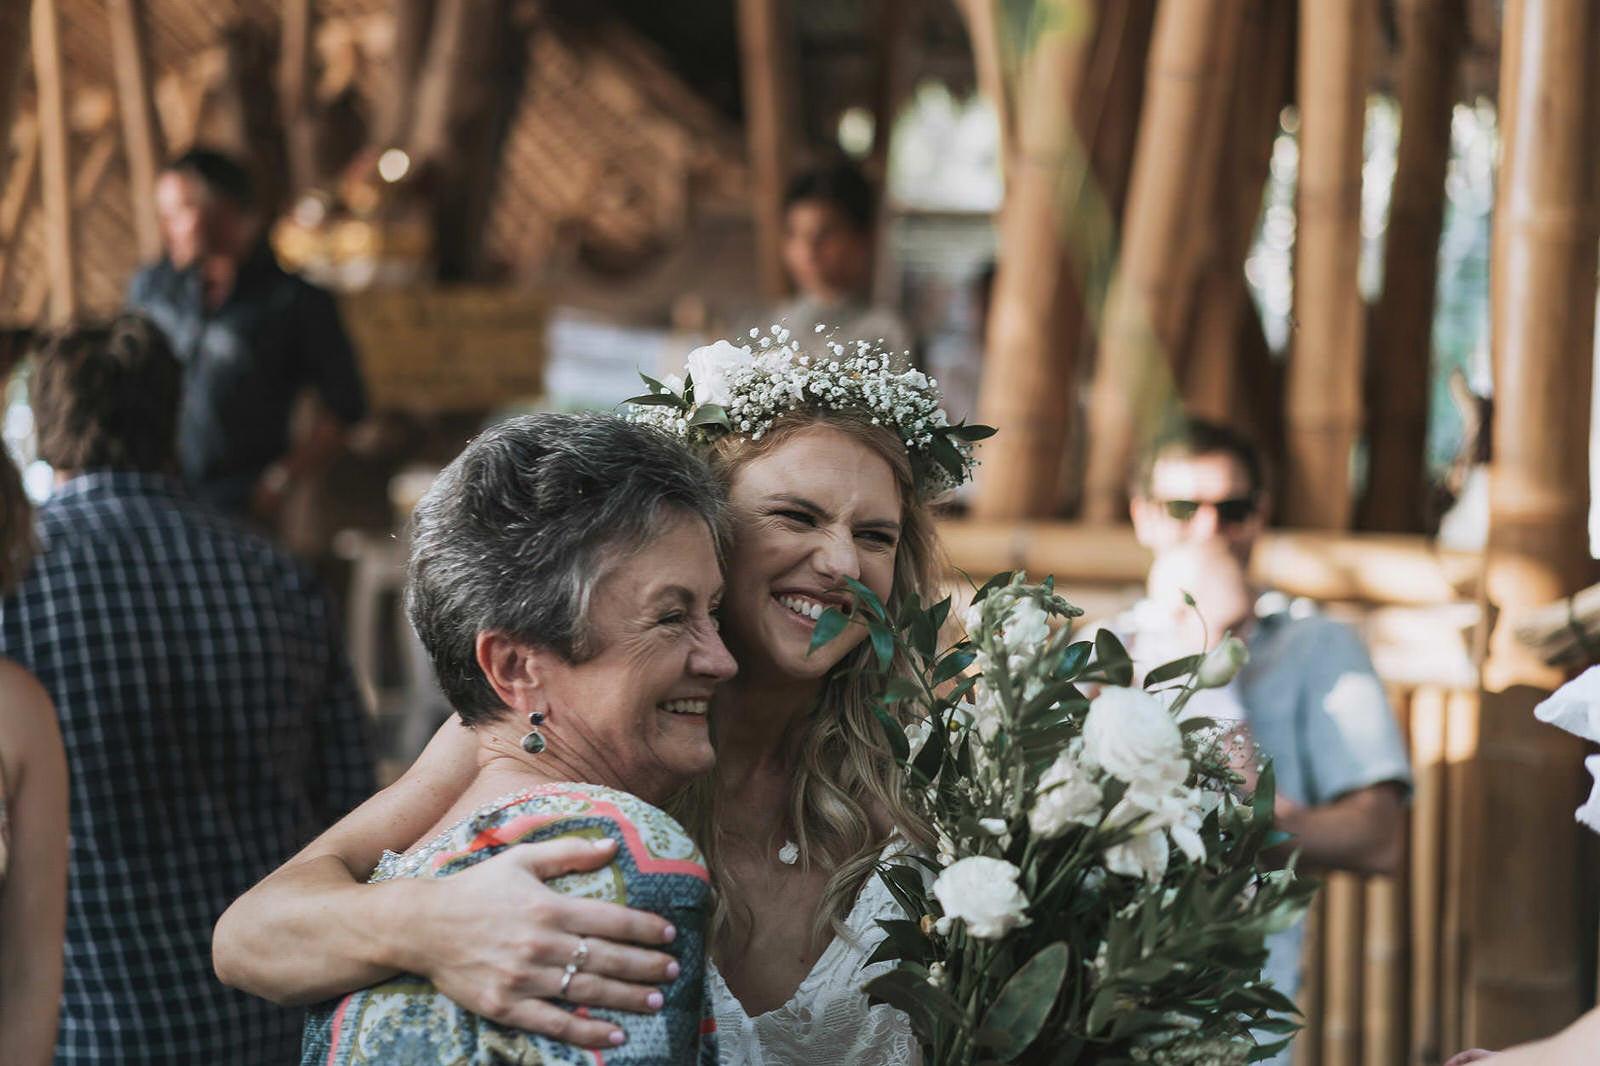 newfound-hai-tide-nusa-lembongan-bali-wedding-photographers-123